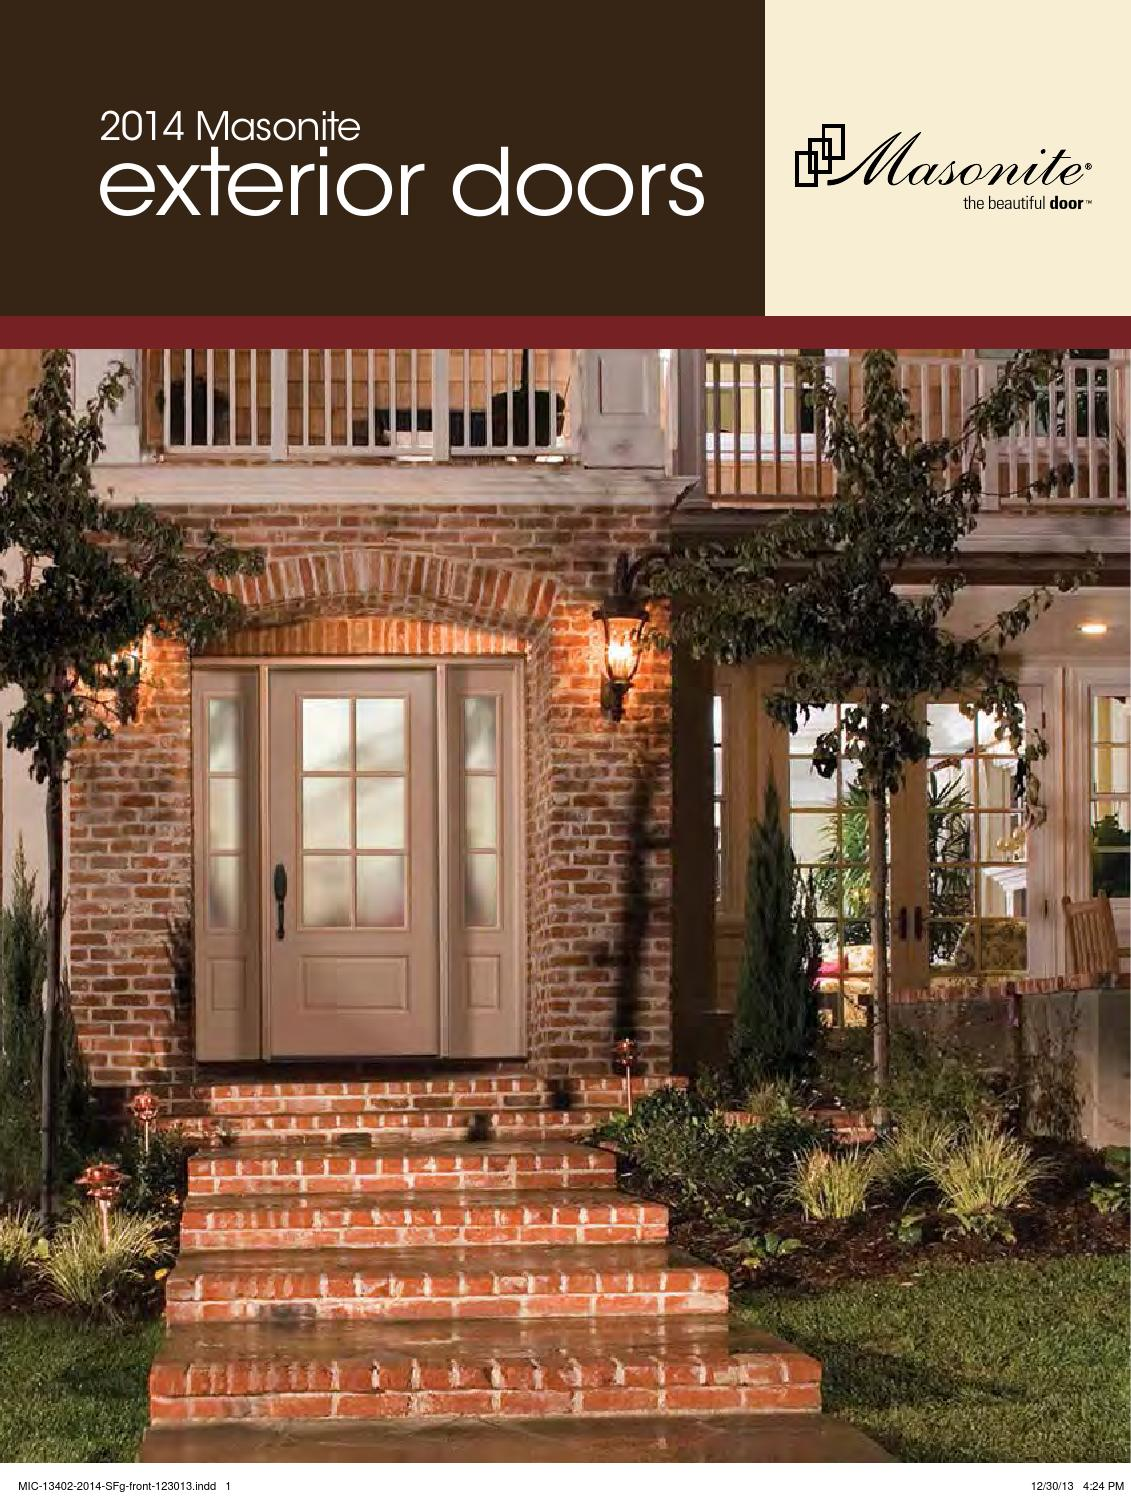 2014 Masonite Exterior Door Catalog by Meek Lumber Company - issuu